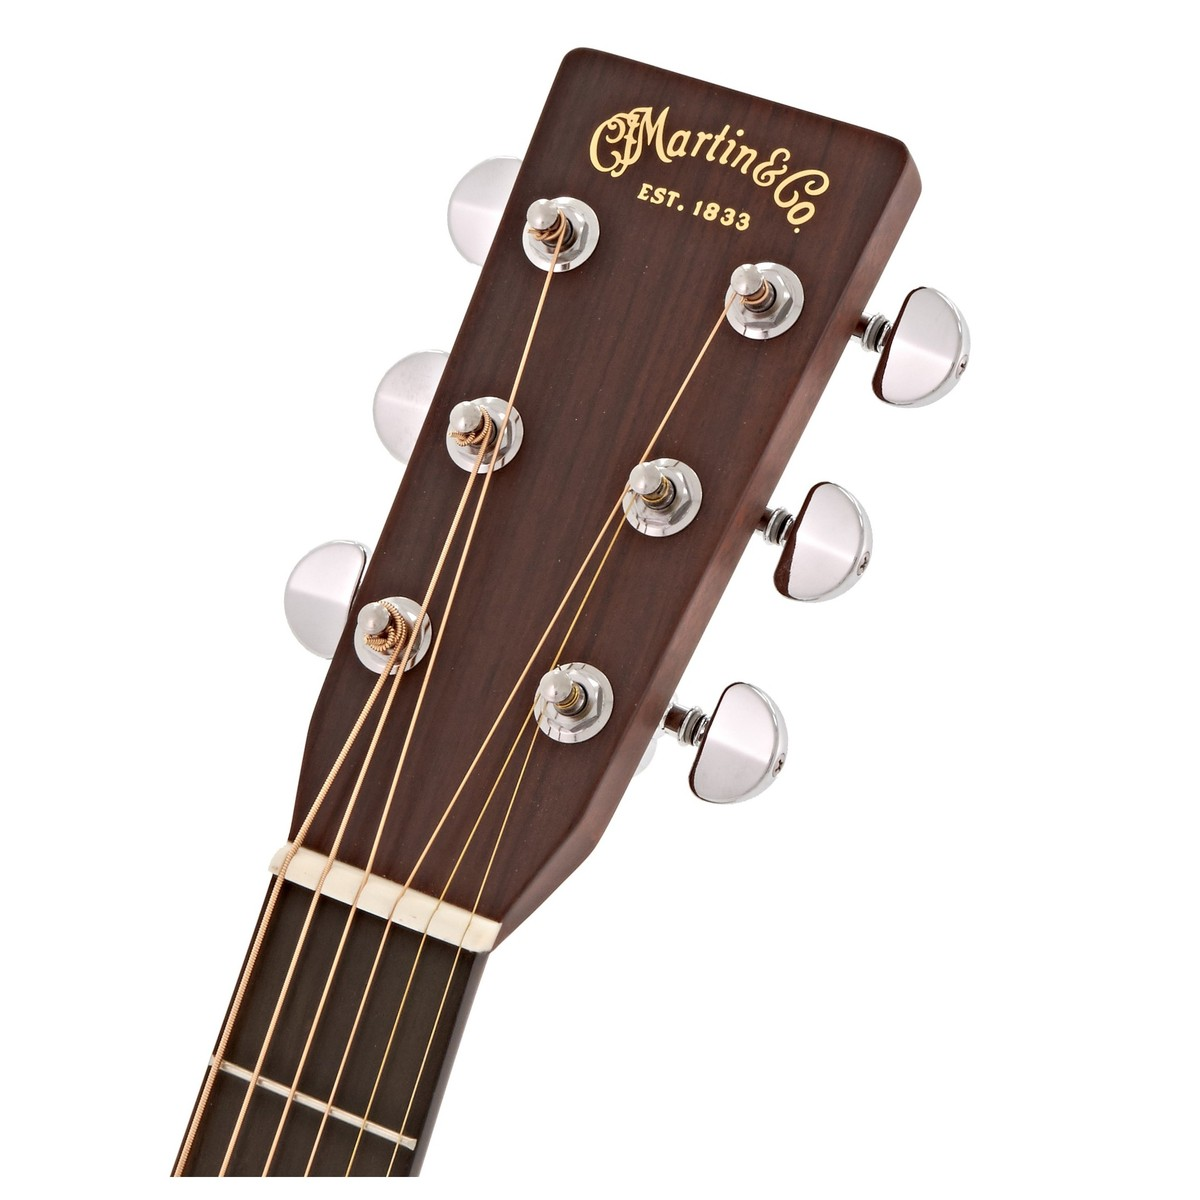 martin d 28 dreadnought acoustic guitar at. Black Bedroom Furniture Sets. Home Design Ideas